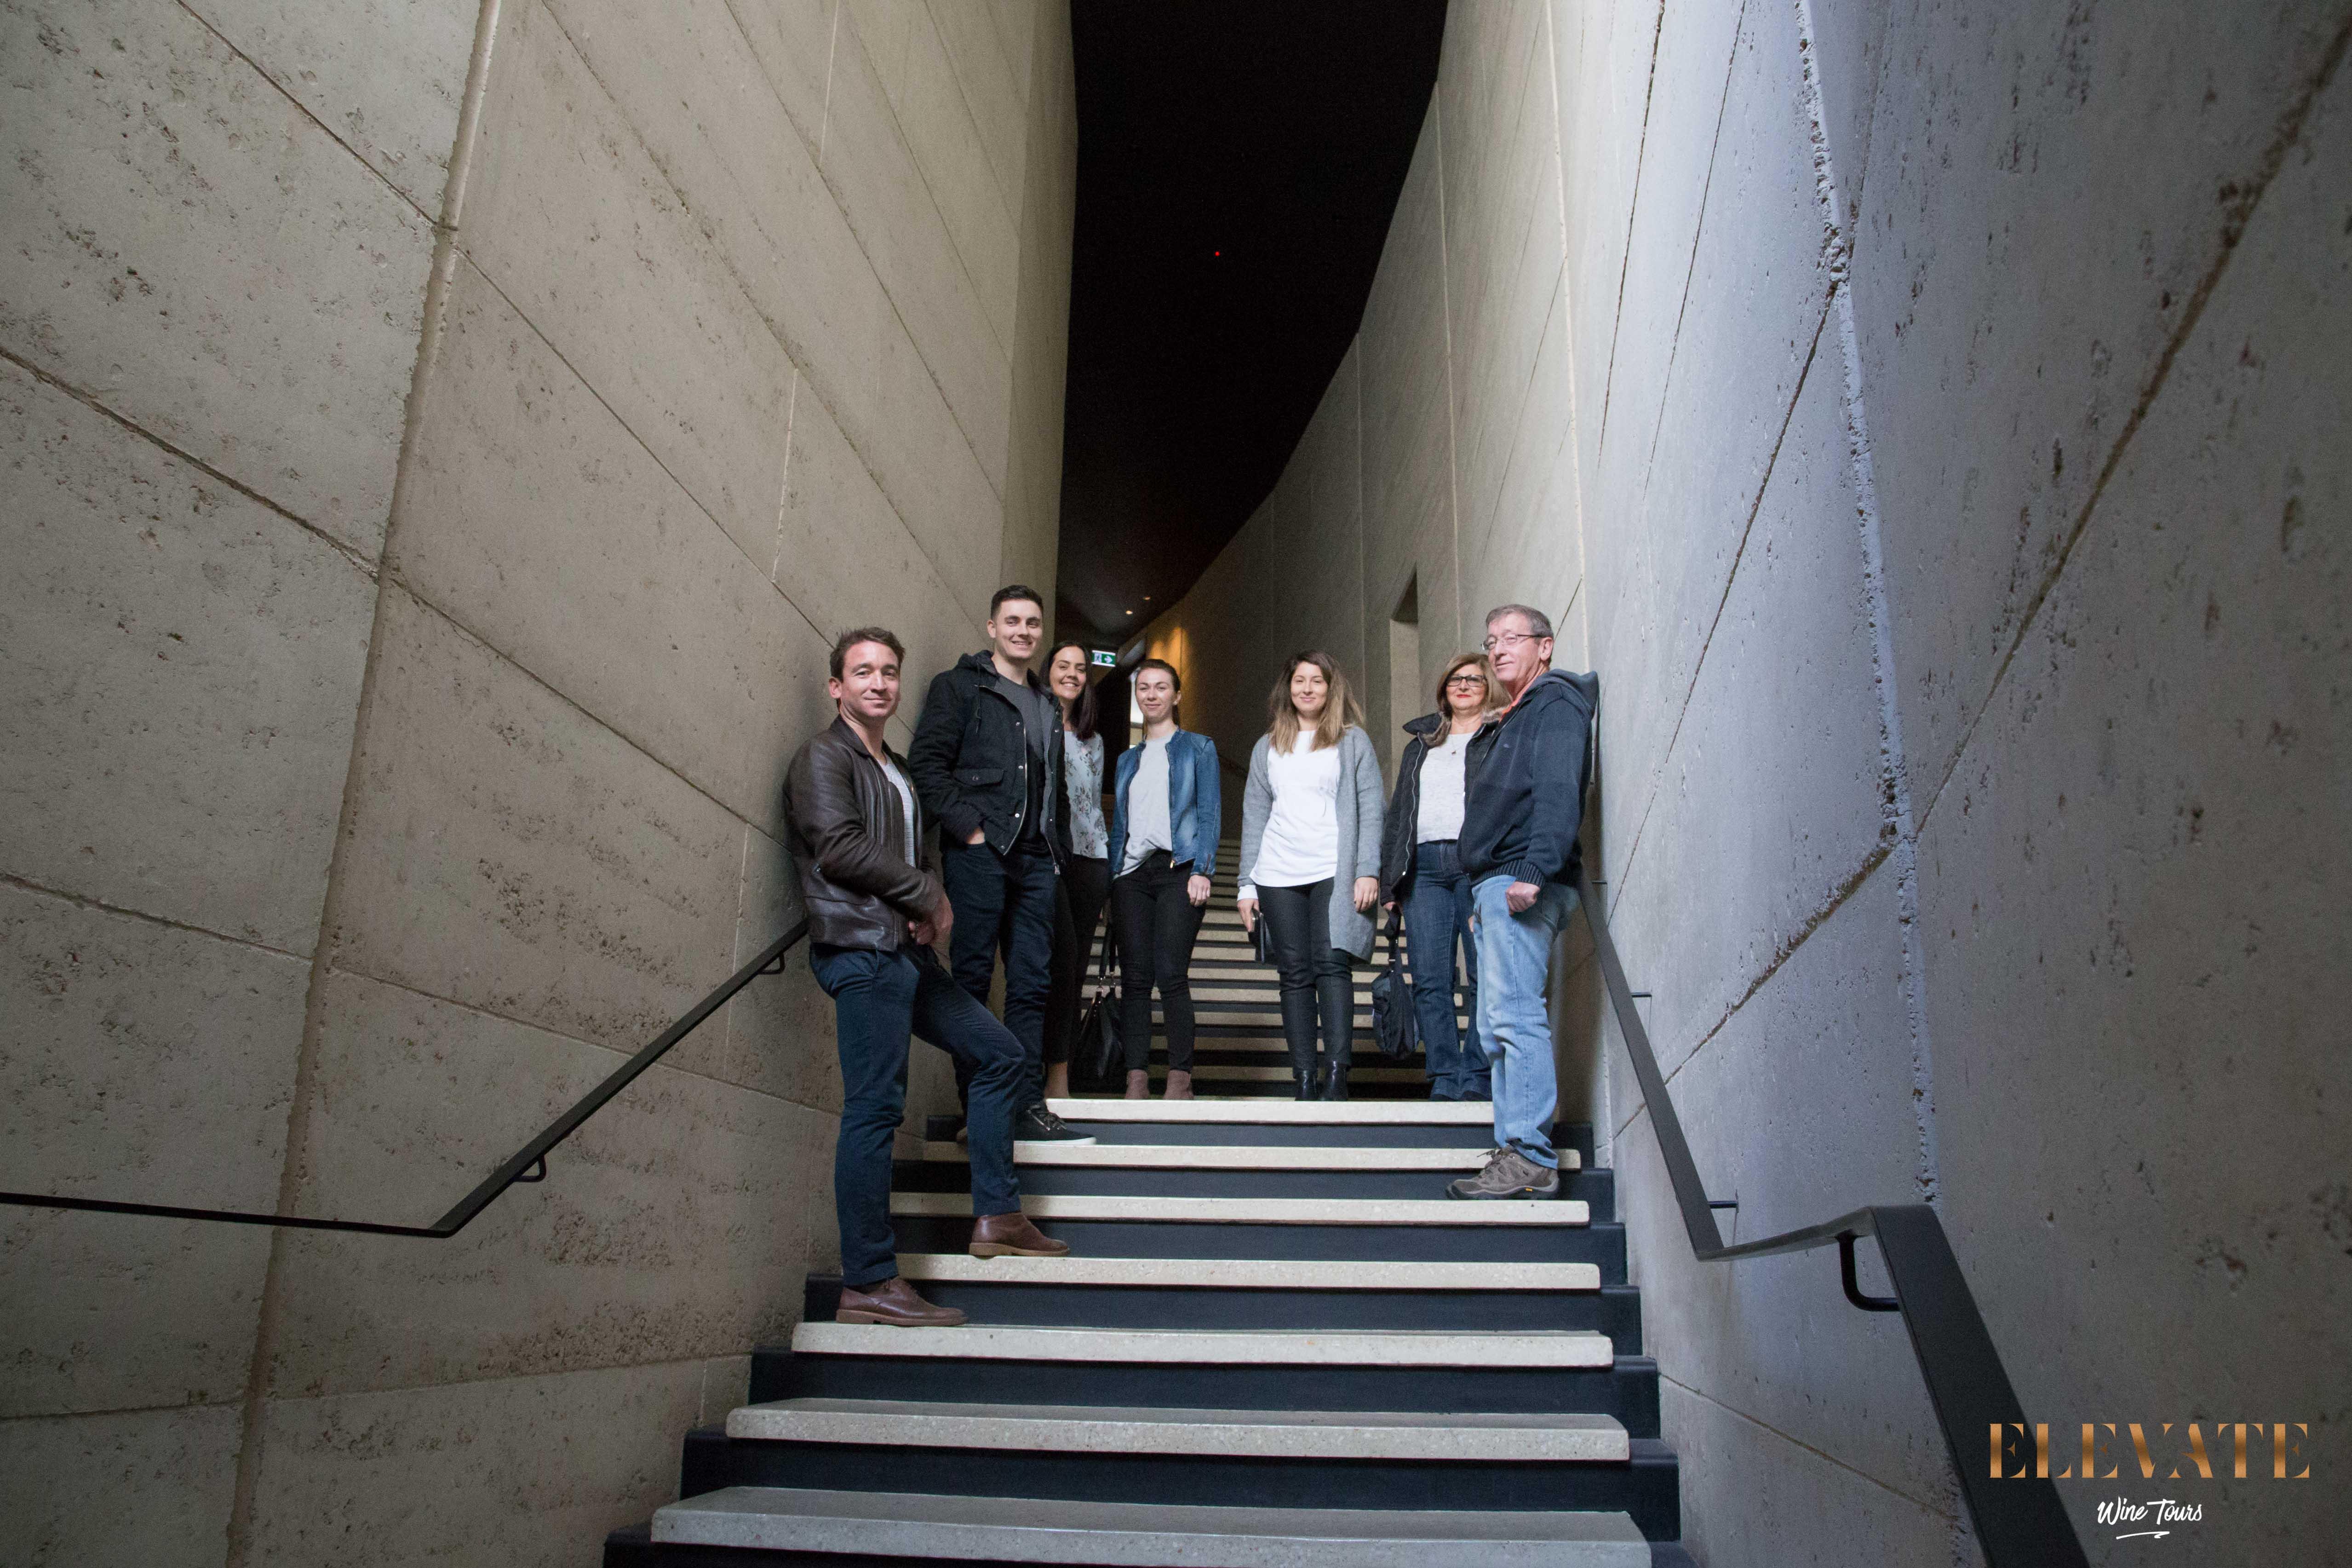 MORNINGTON-PENINSULA-WINERY-TOUR-ELEVATE-2